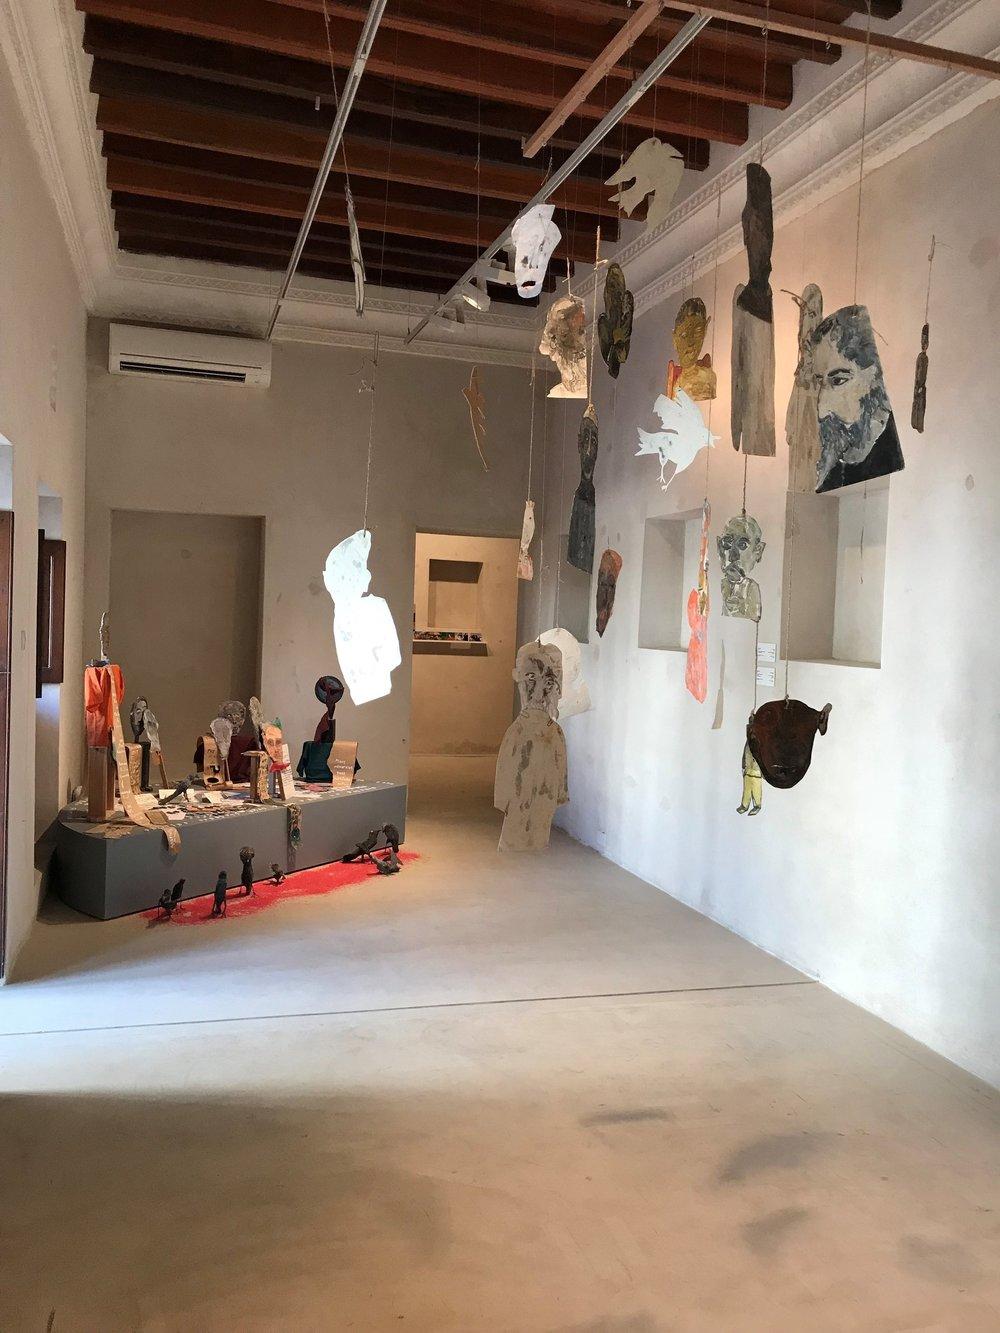 Anna Boghiguian's retrospective at the Sharjah Art Foundation